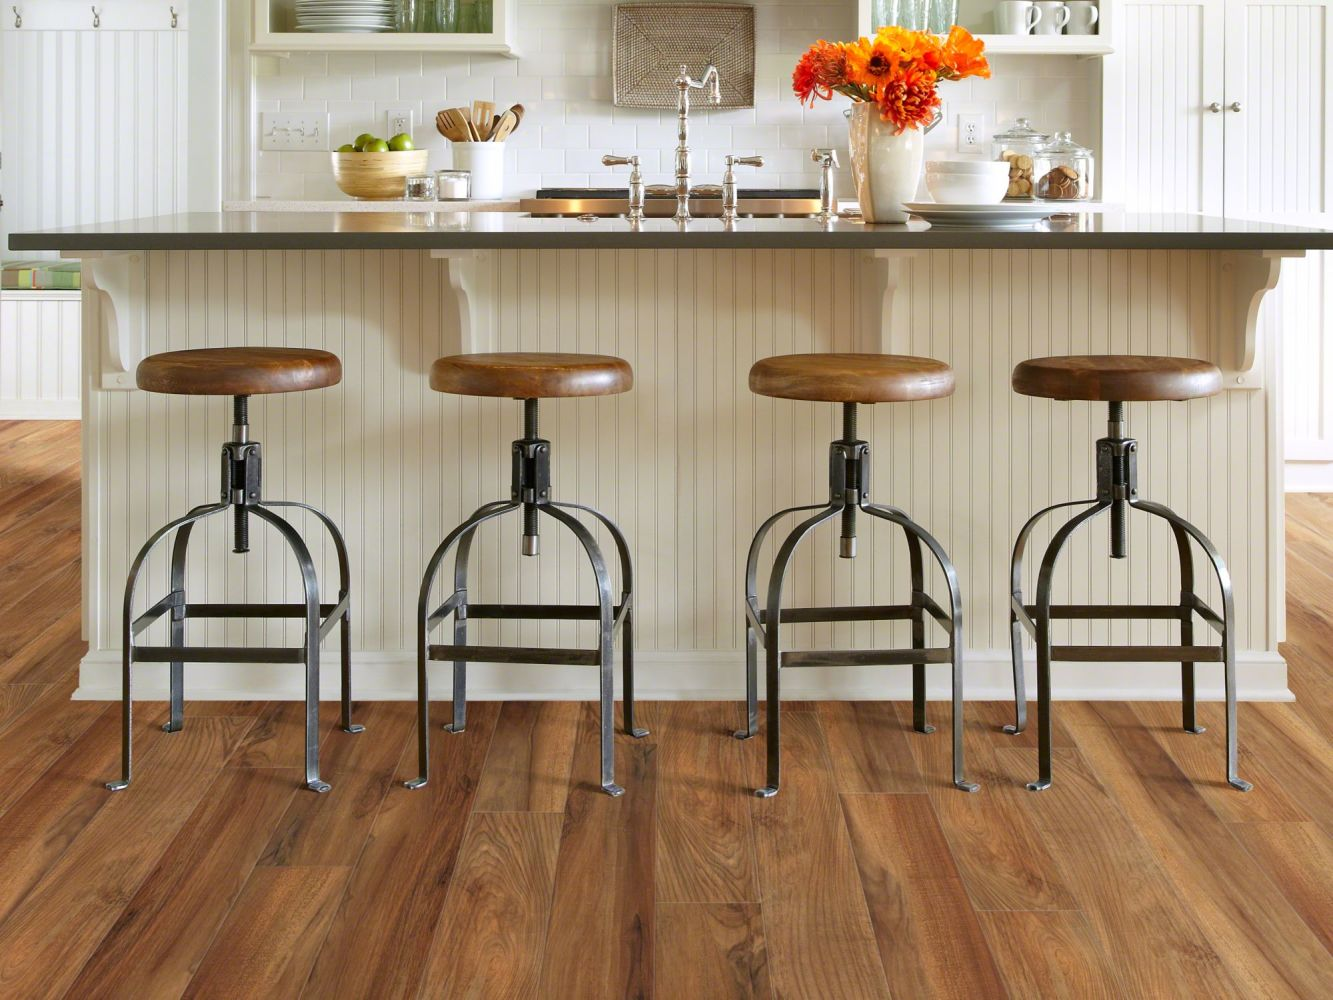 Shaw Floors Resilient Residential Islip Venna 00820_HSS40